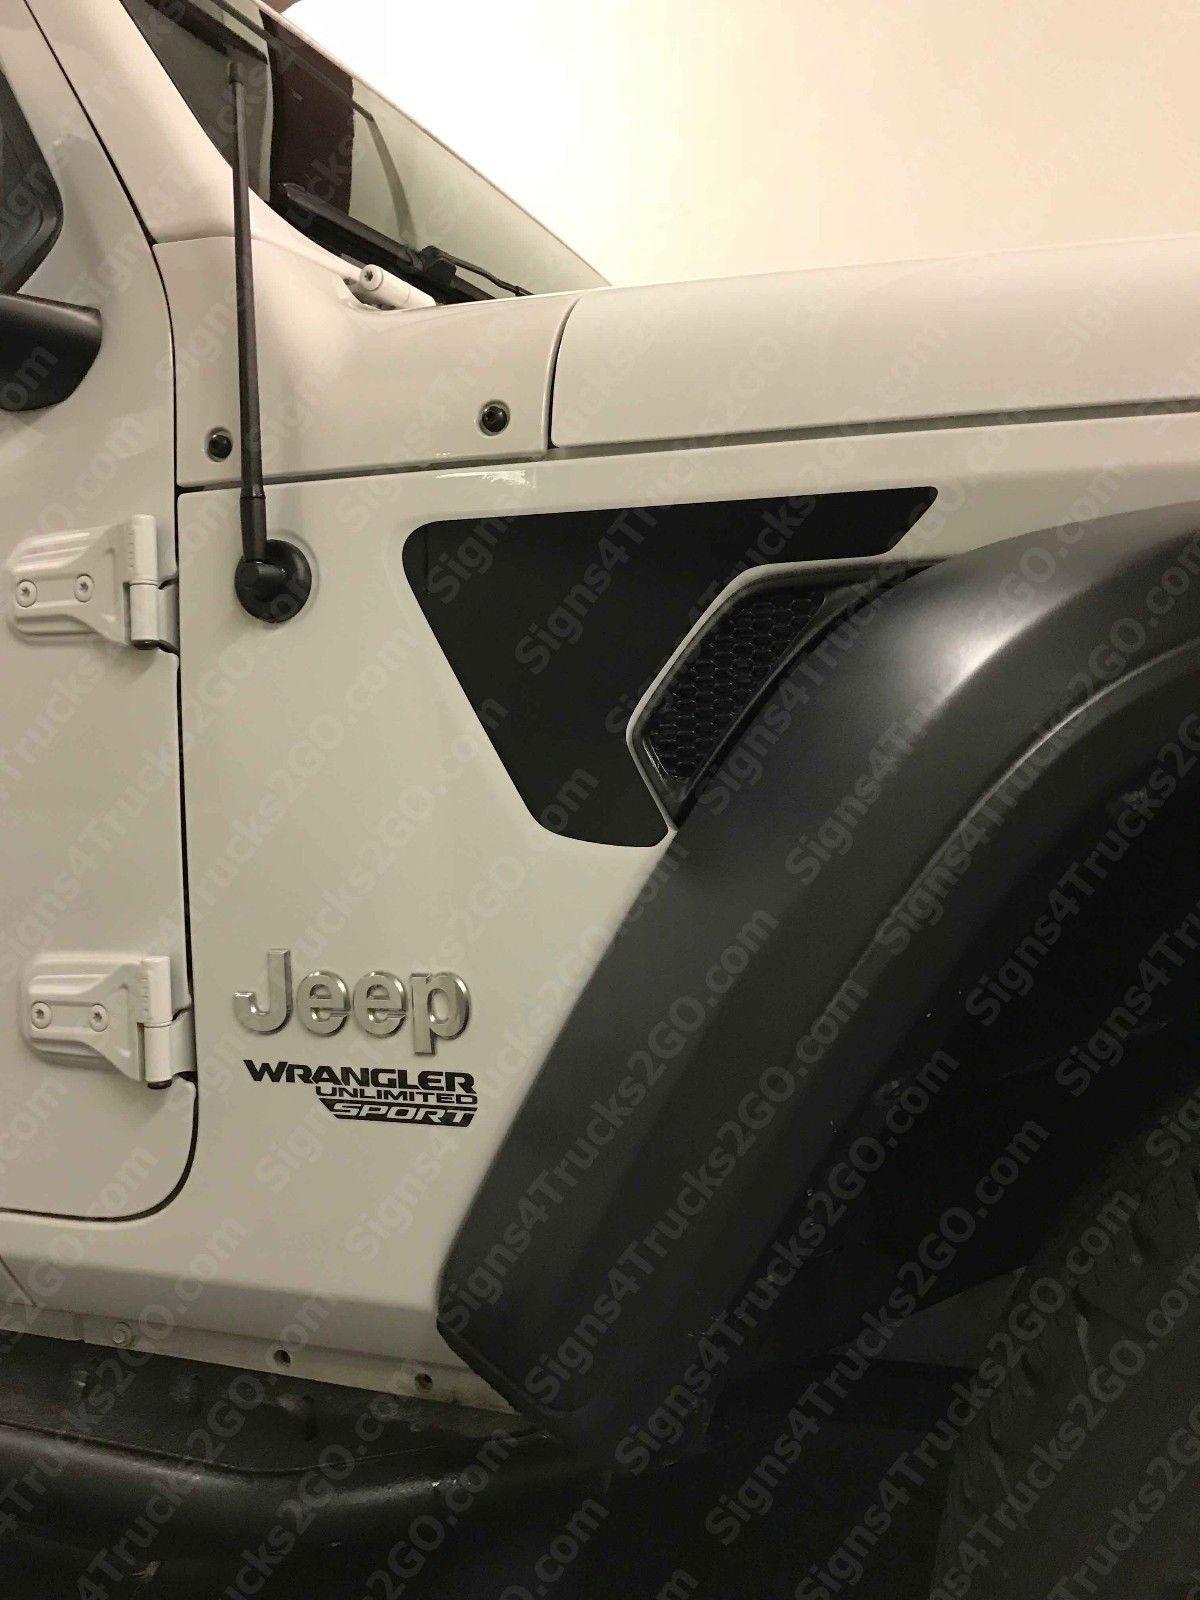 2pcs Jeep Wrangler Sahara Rubicon 2018 Fender Vent Blackout Vinyl Decal Sticker Graphic 2018 Jl Jlu Jeep Wrangler Sahara Wrangler Sahara Jeep Wrangler [ 1600 x 1200 Pixel ]